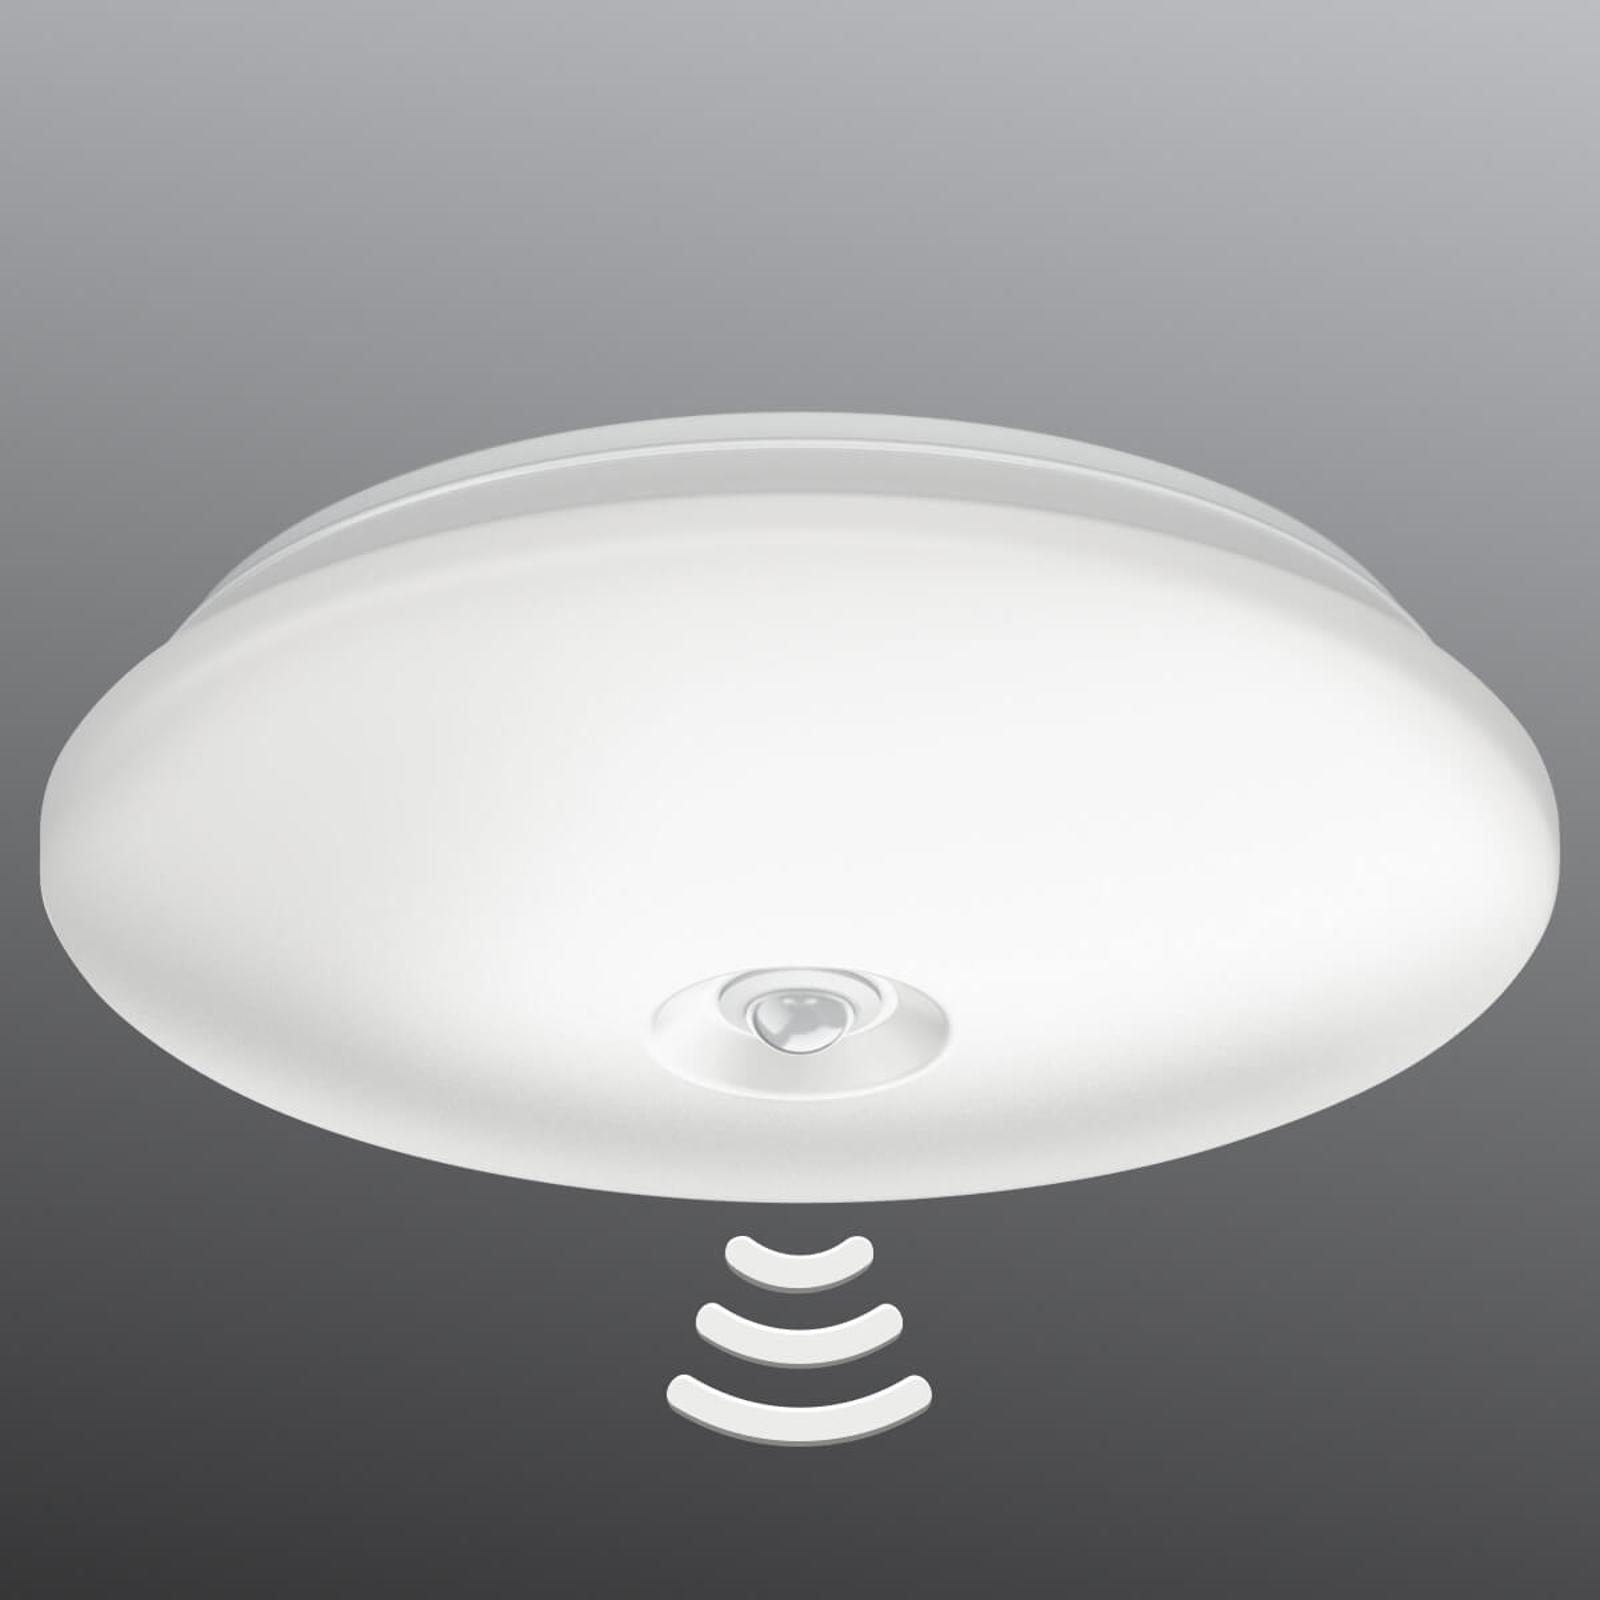 LED taklampe Mauve med IR-sensor, Ø 32cm